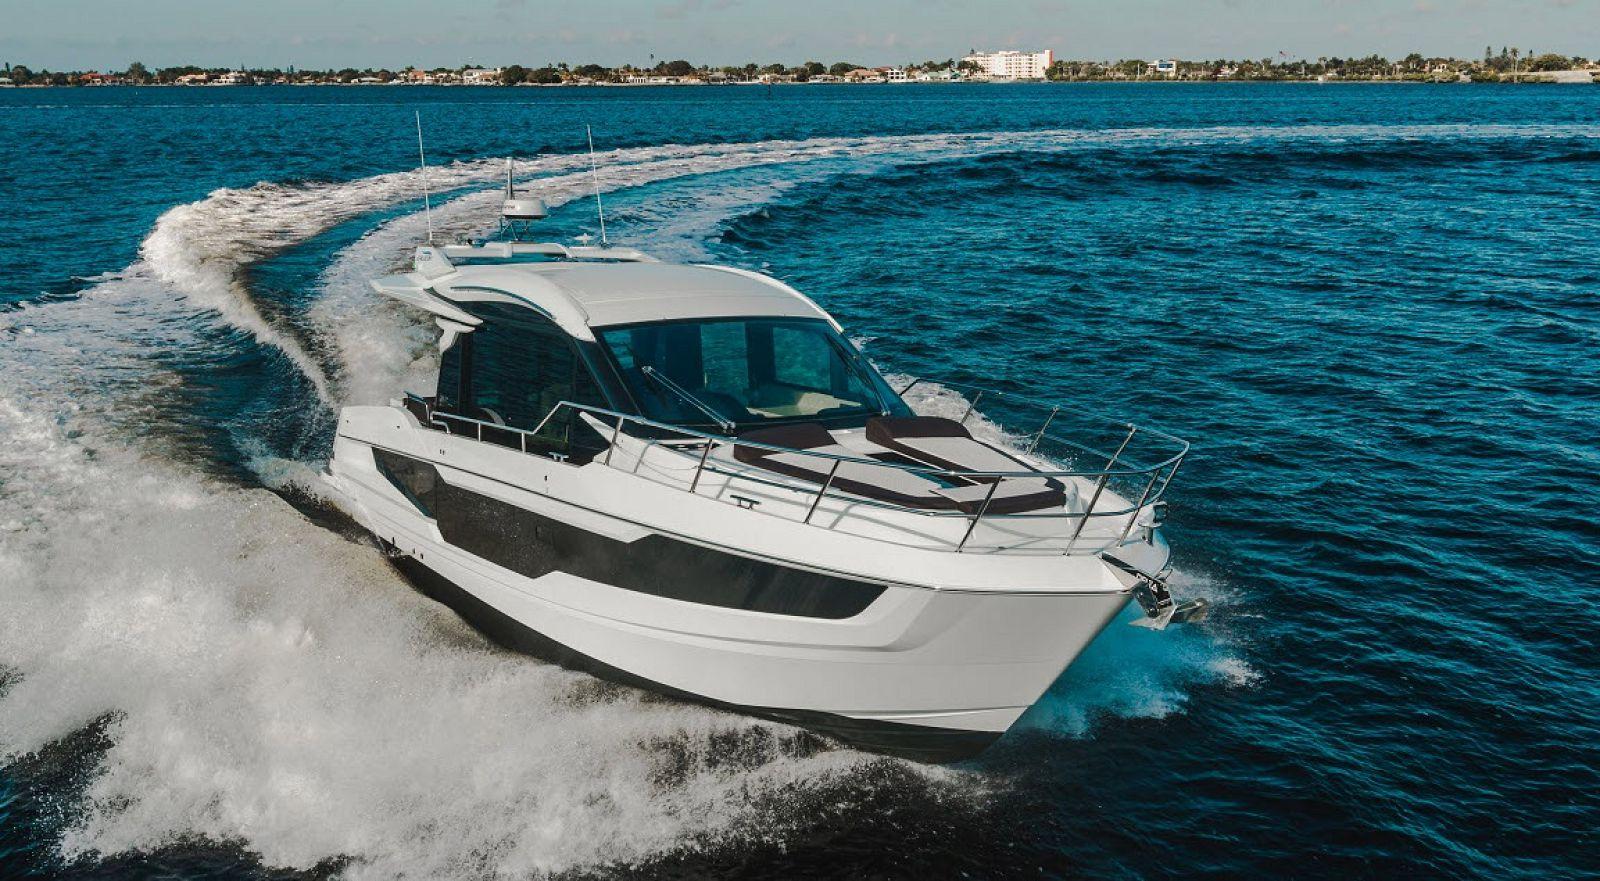 galeon 410 htc yacht